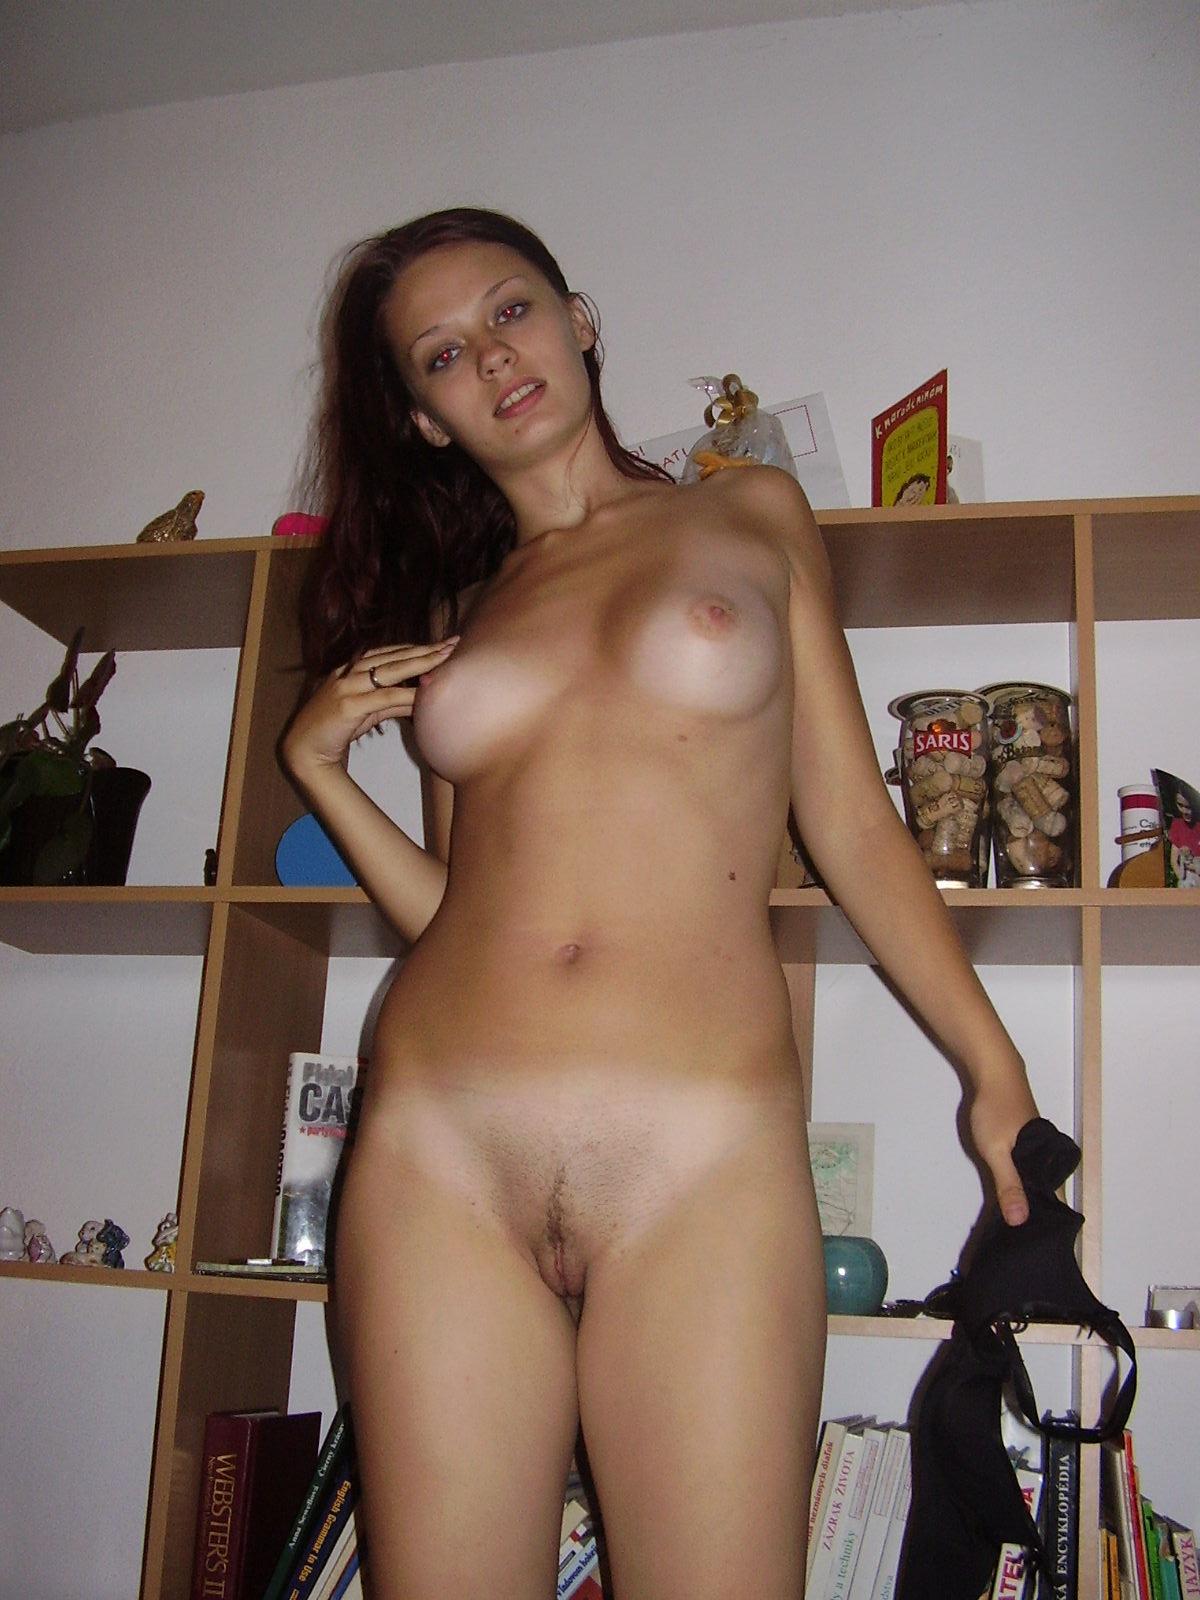 publike-studentki-chastnoe-foto-golie-russkie-porno-vhod